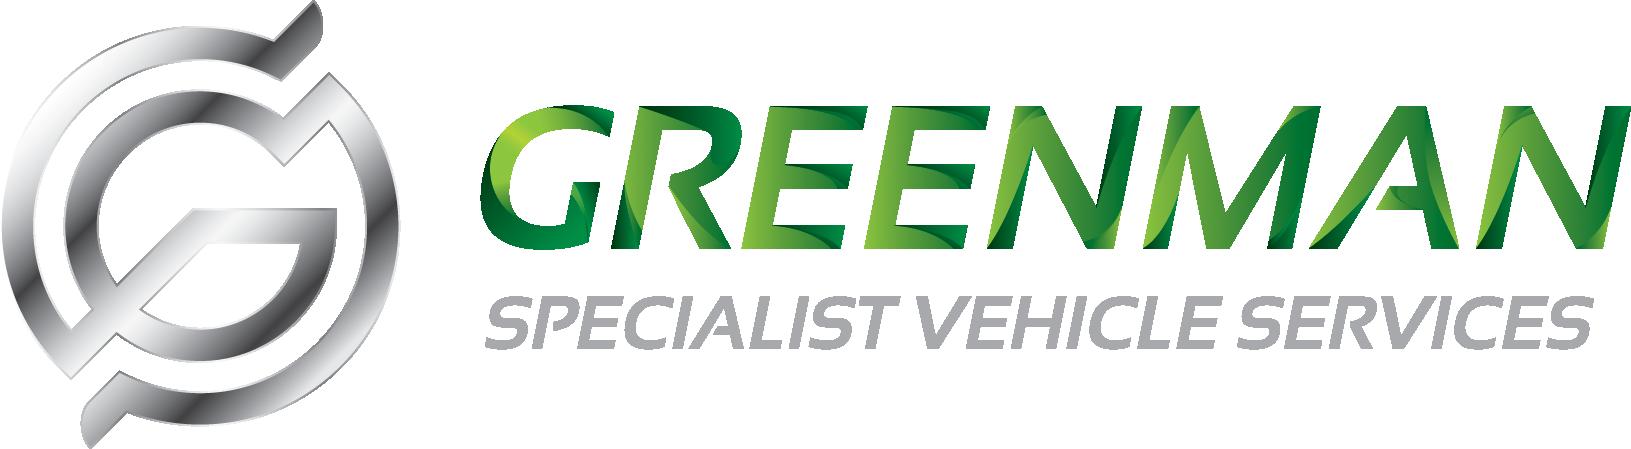 Greenman Specialist Vehicle Services Ltd